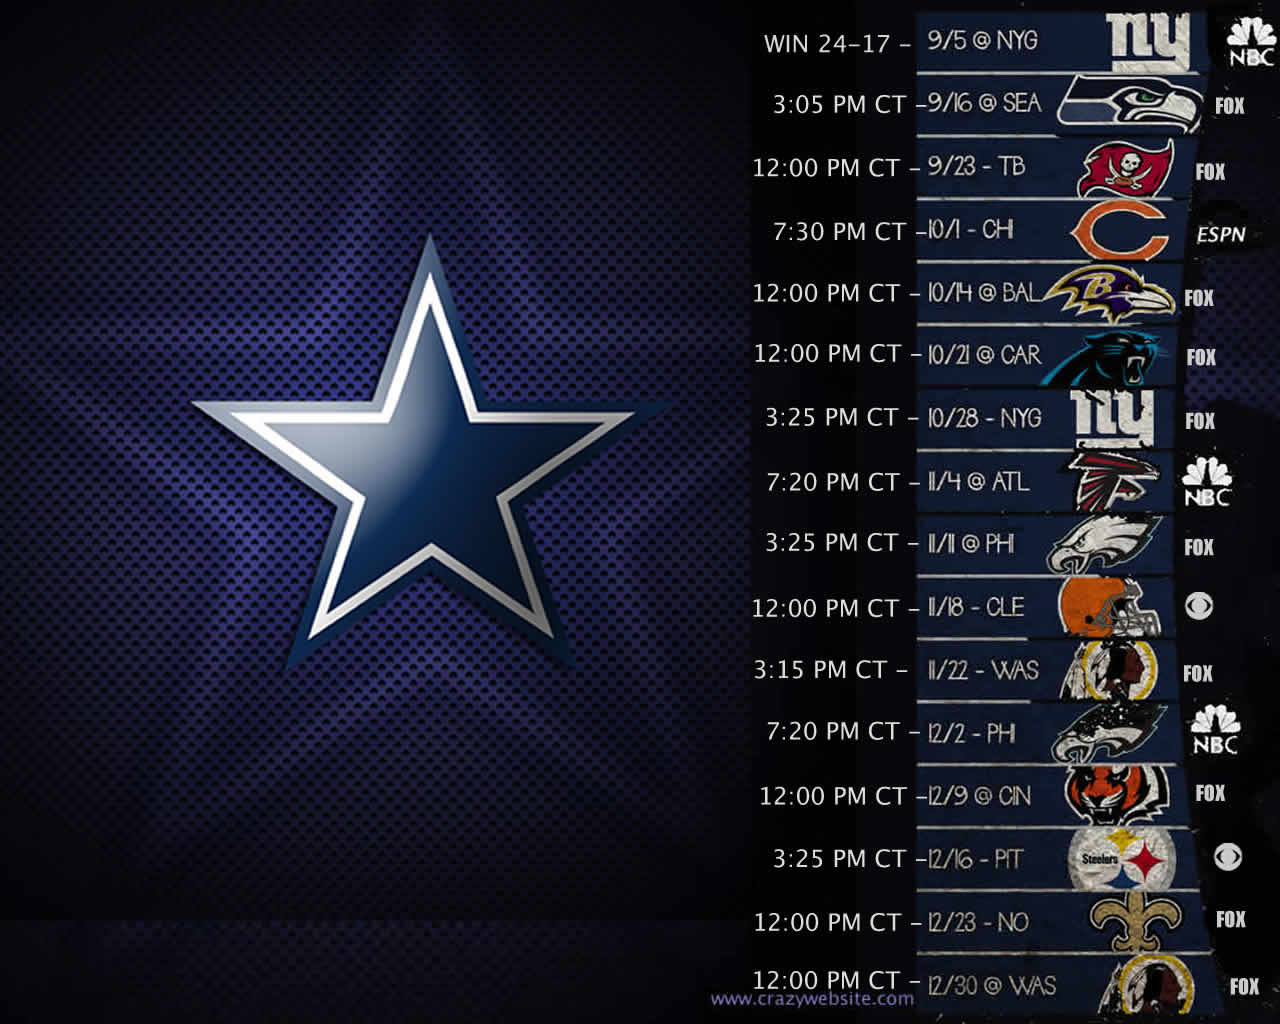 Wallpaper 2012 Schedule Dallas Cowboys 1280x1024jpg 1280x1024